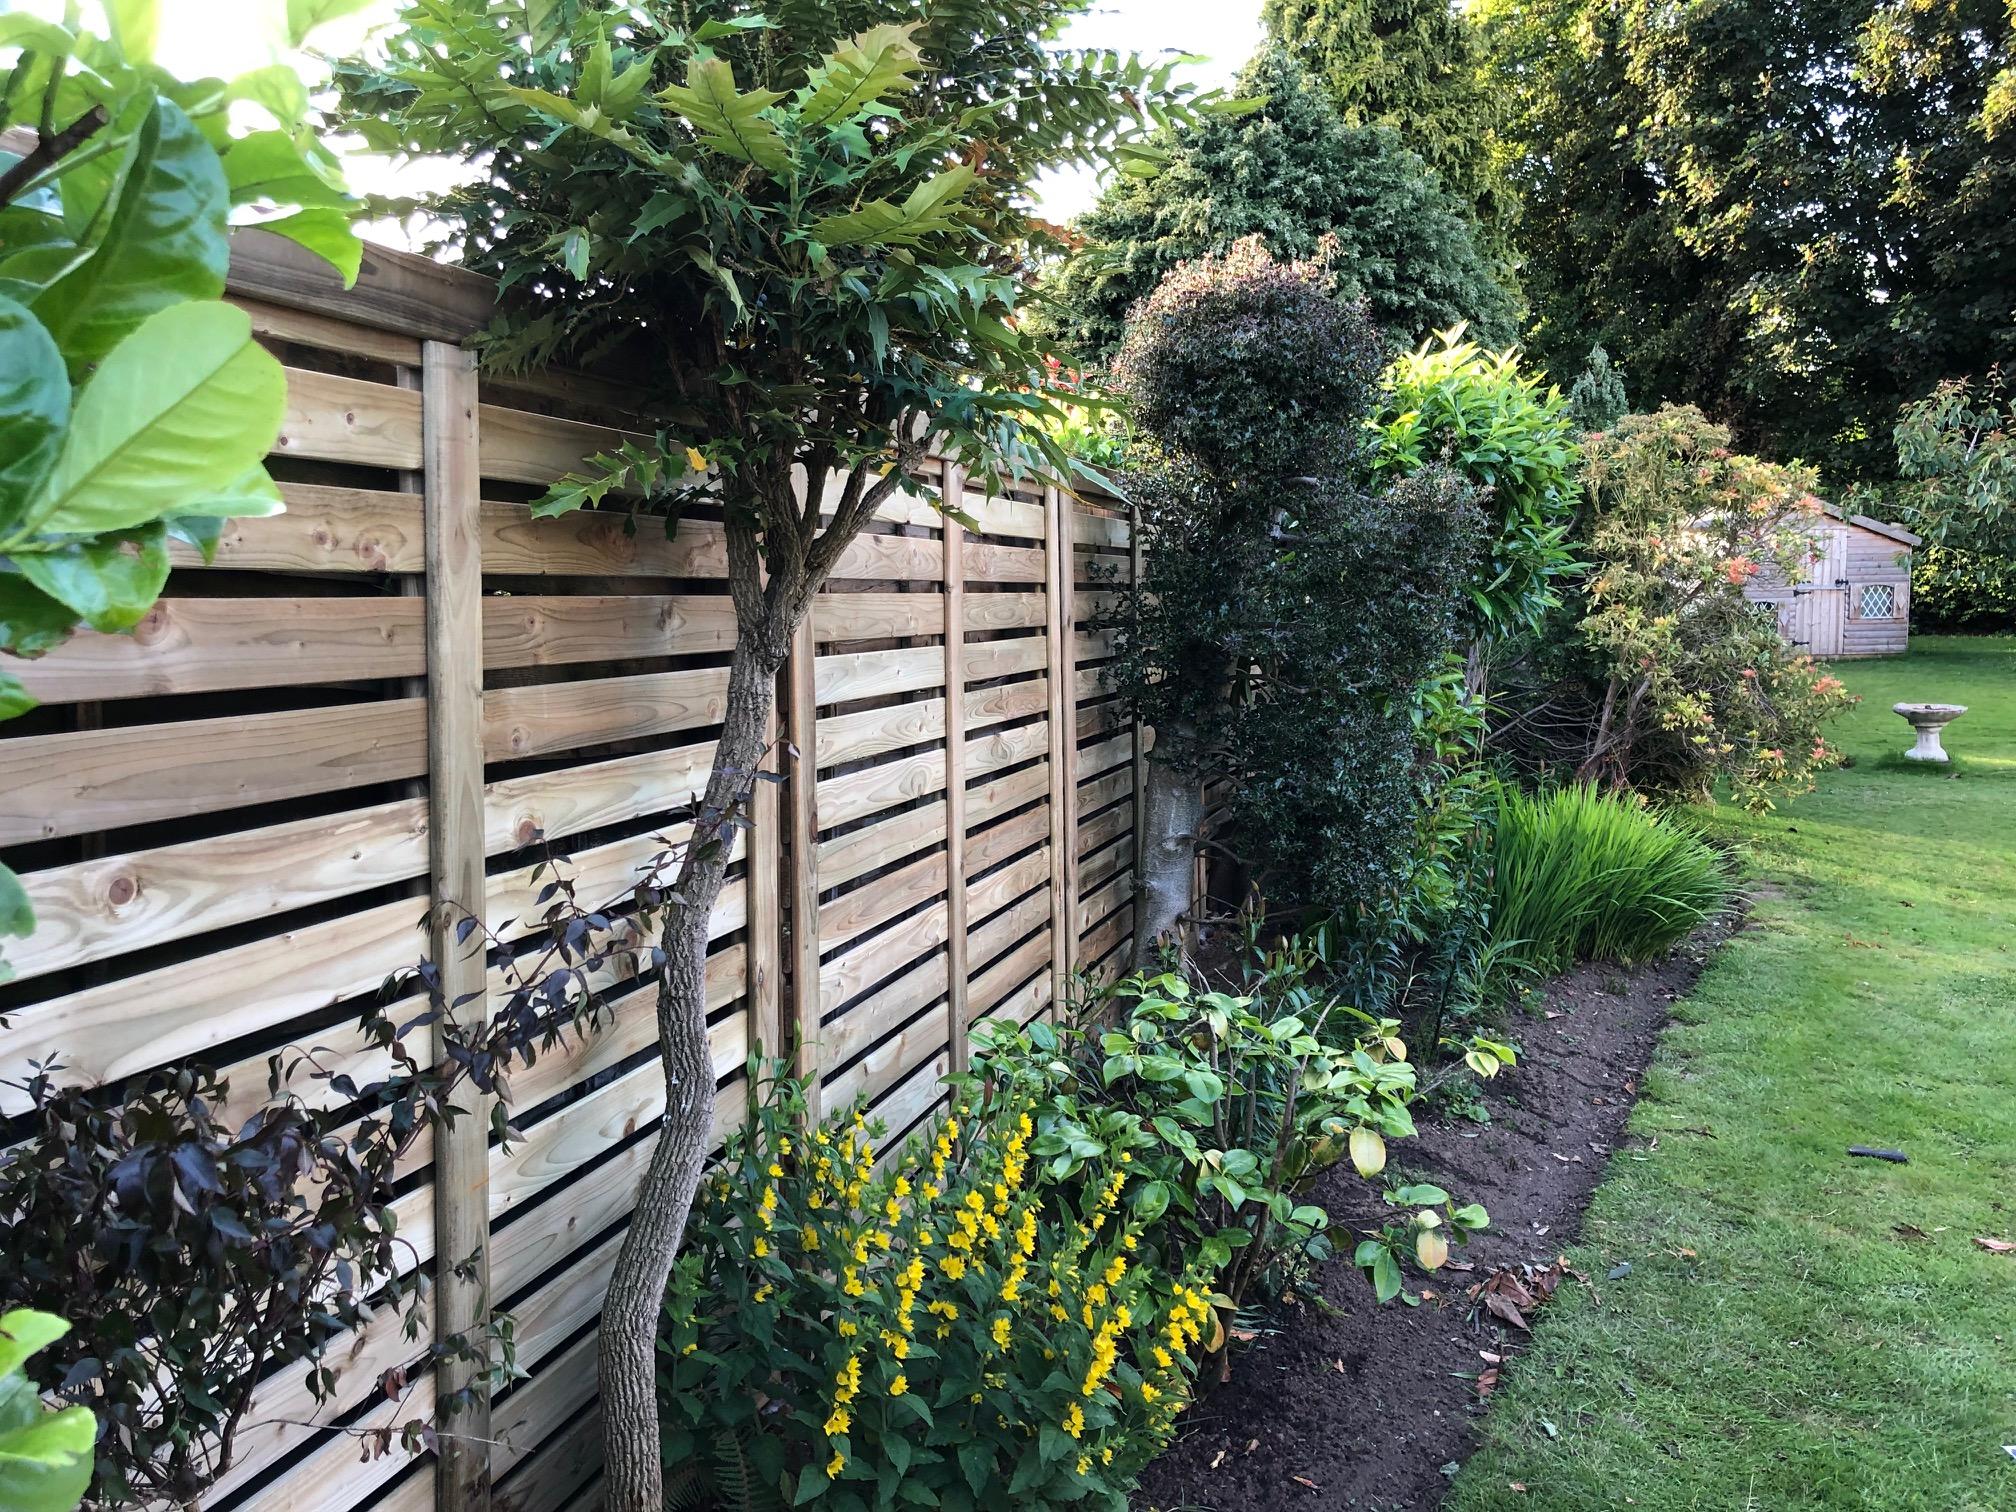 The Lurig panel looking rather splendid in a customers garden.